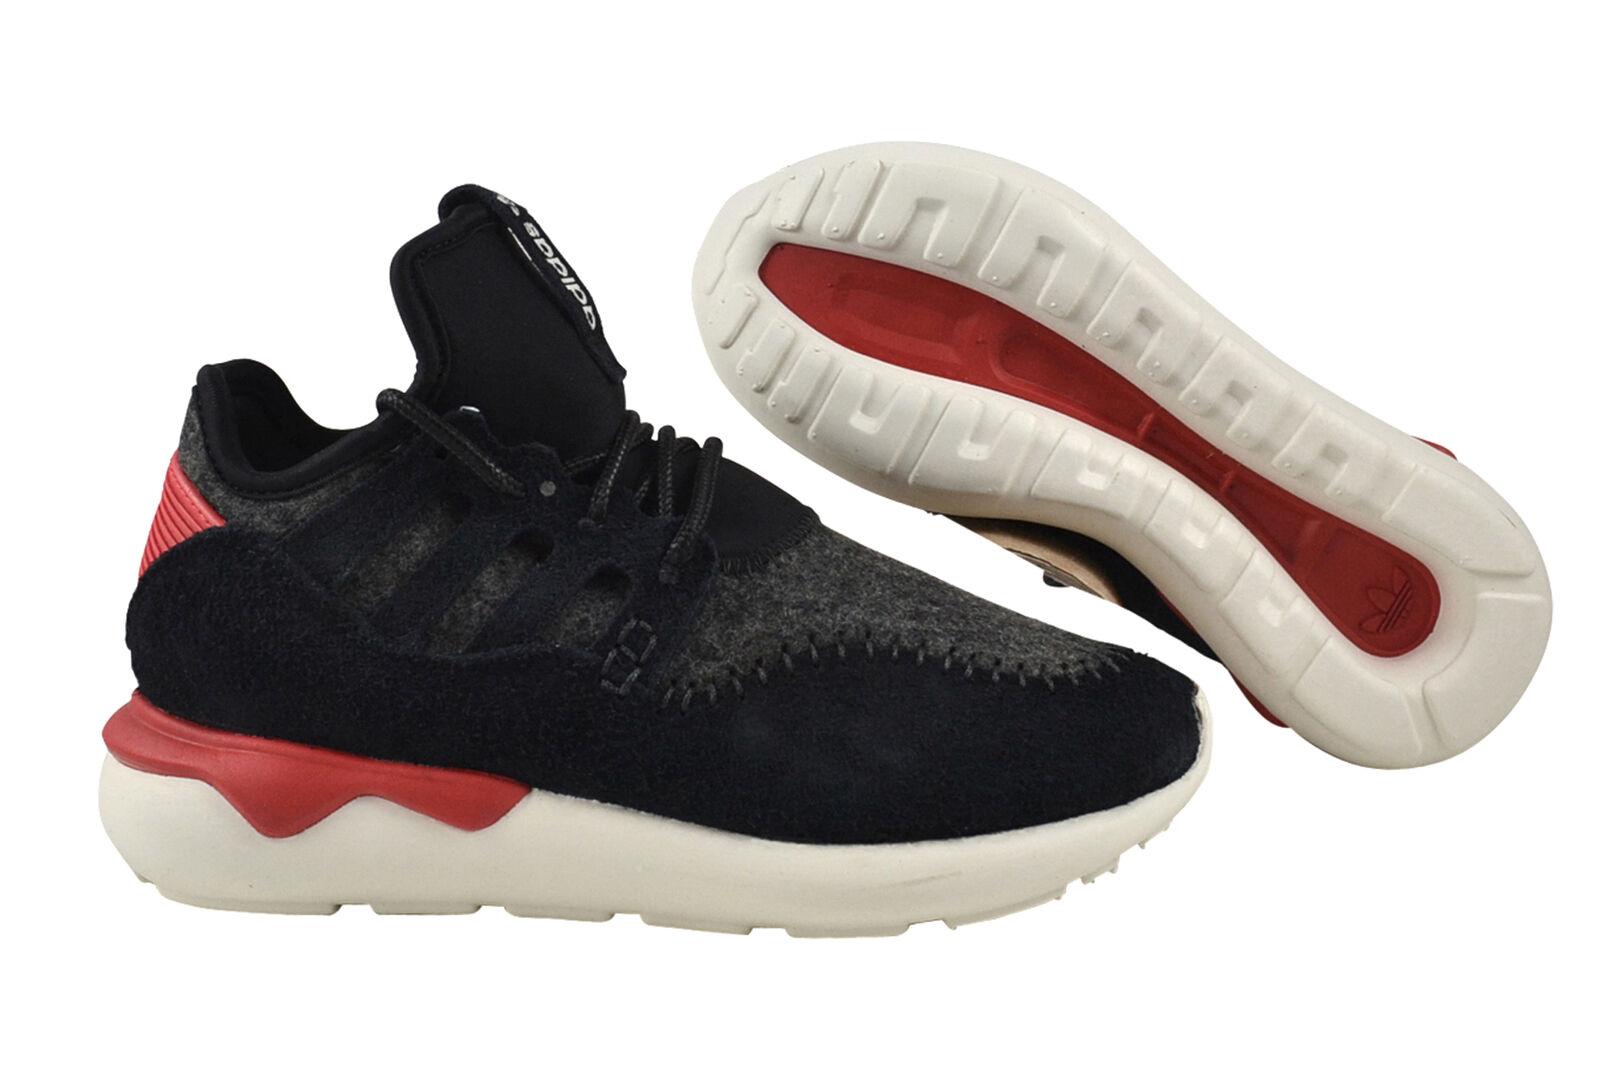 Adidas Tubular Moc Runner black/tomato/off white Laufschuhe B24693